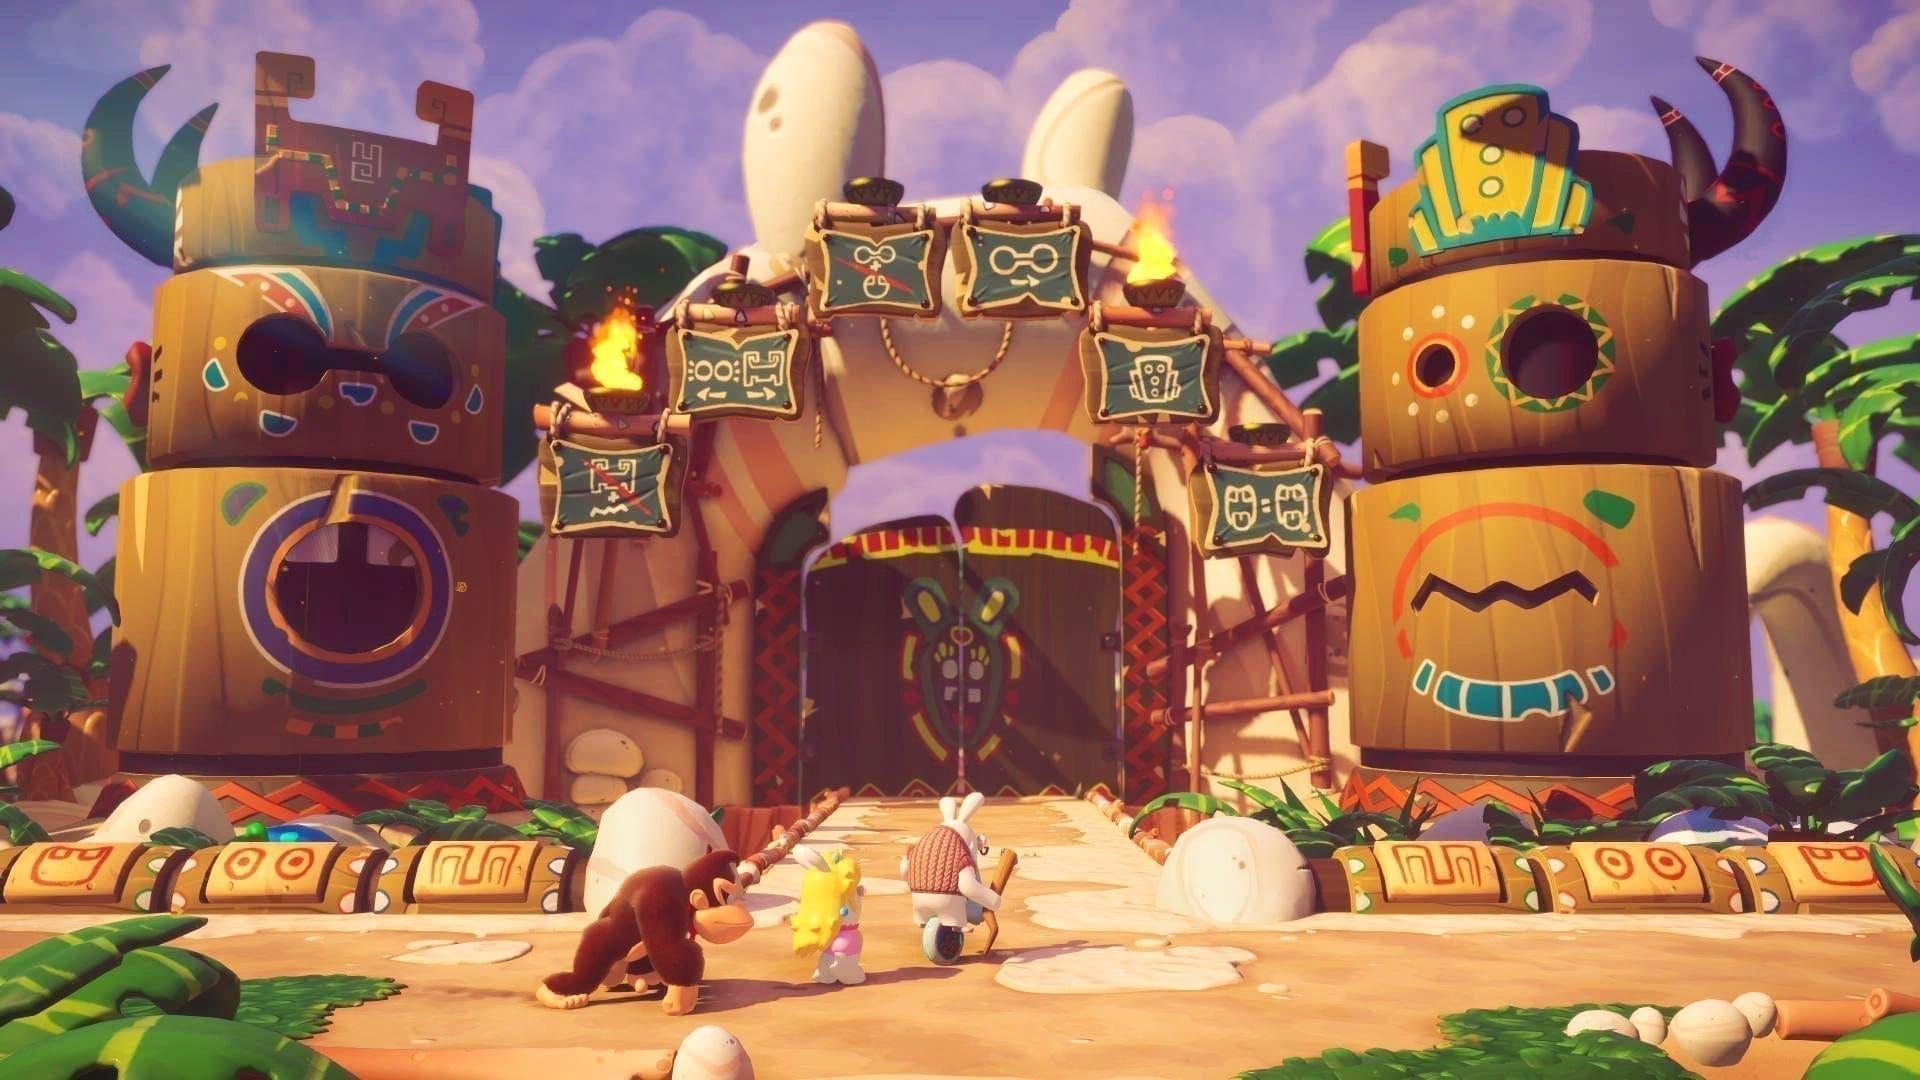 Mario + Rabbids Kingdom Battle - Donkey Kong Adventure